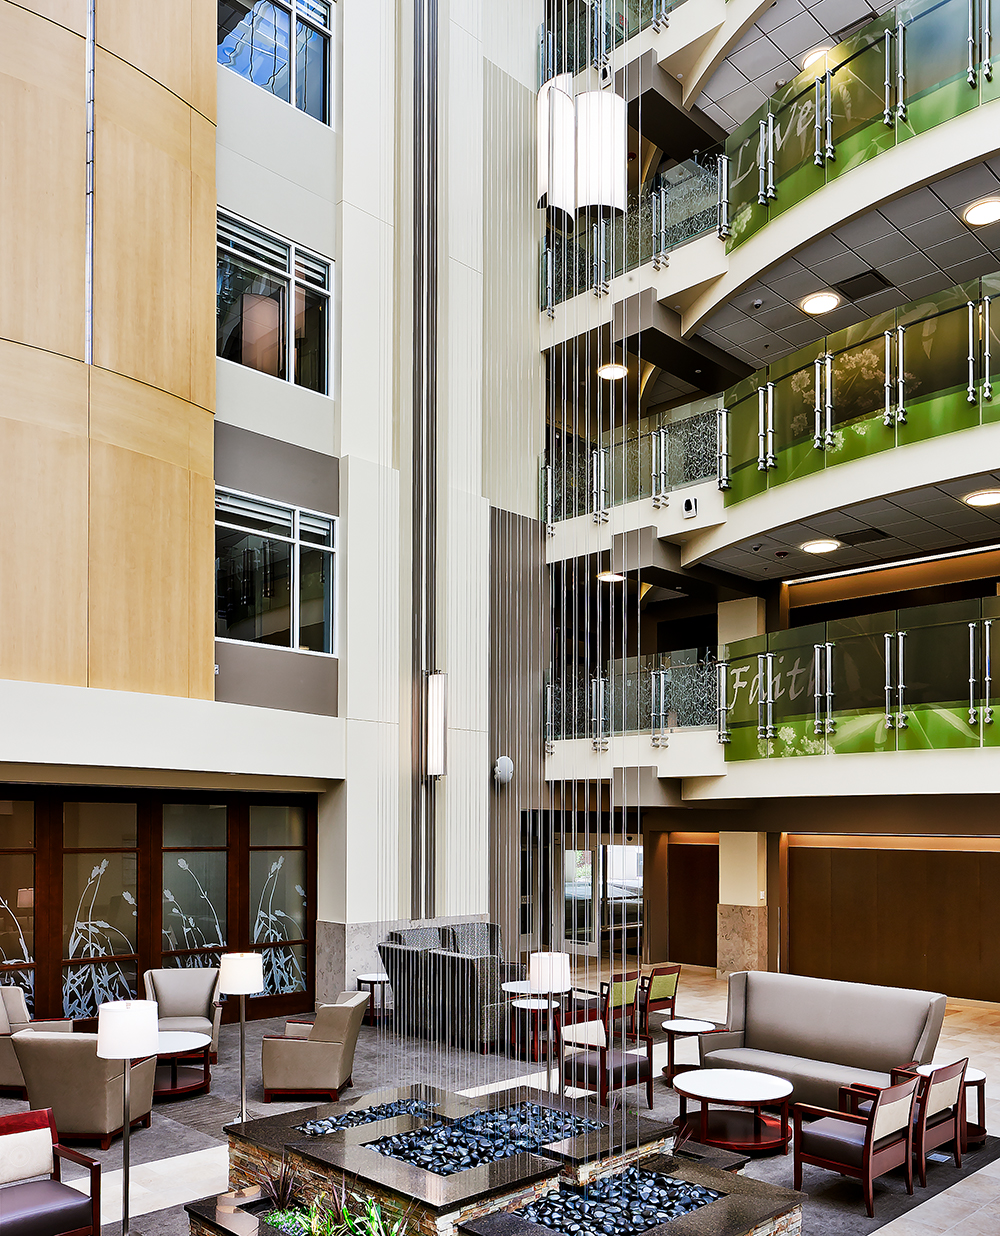 Air Foil large venue fixtures float above a healthcare design lobby to light up multiple floors.